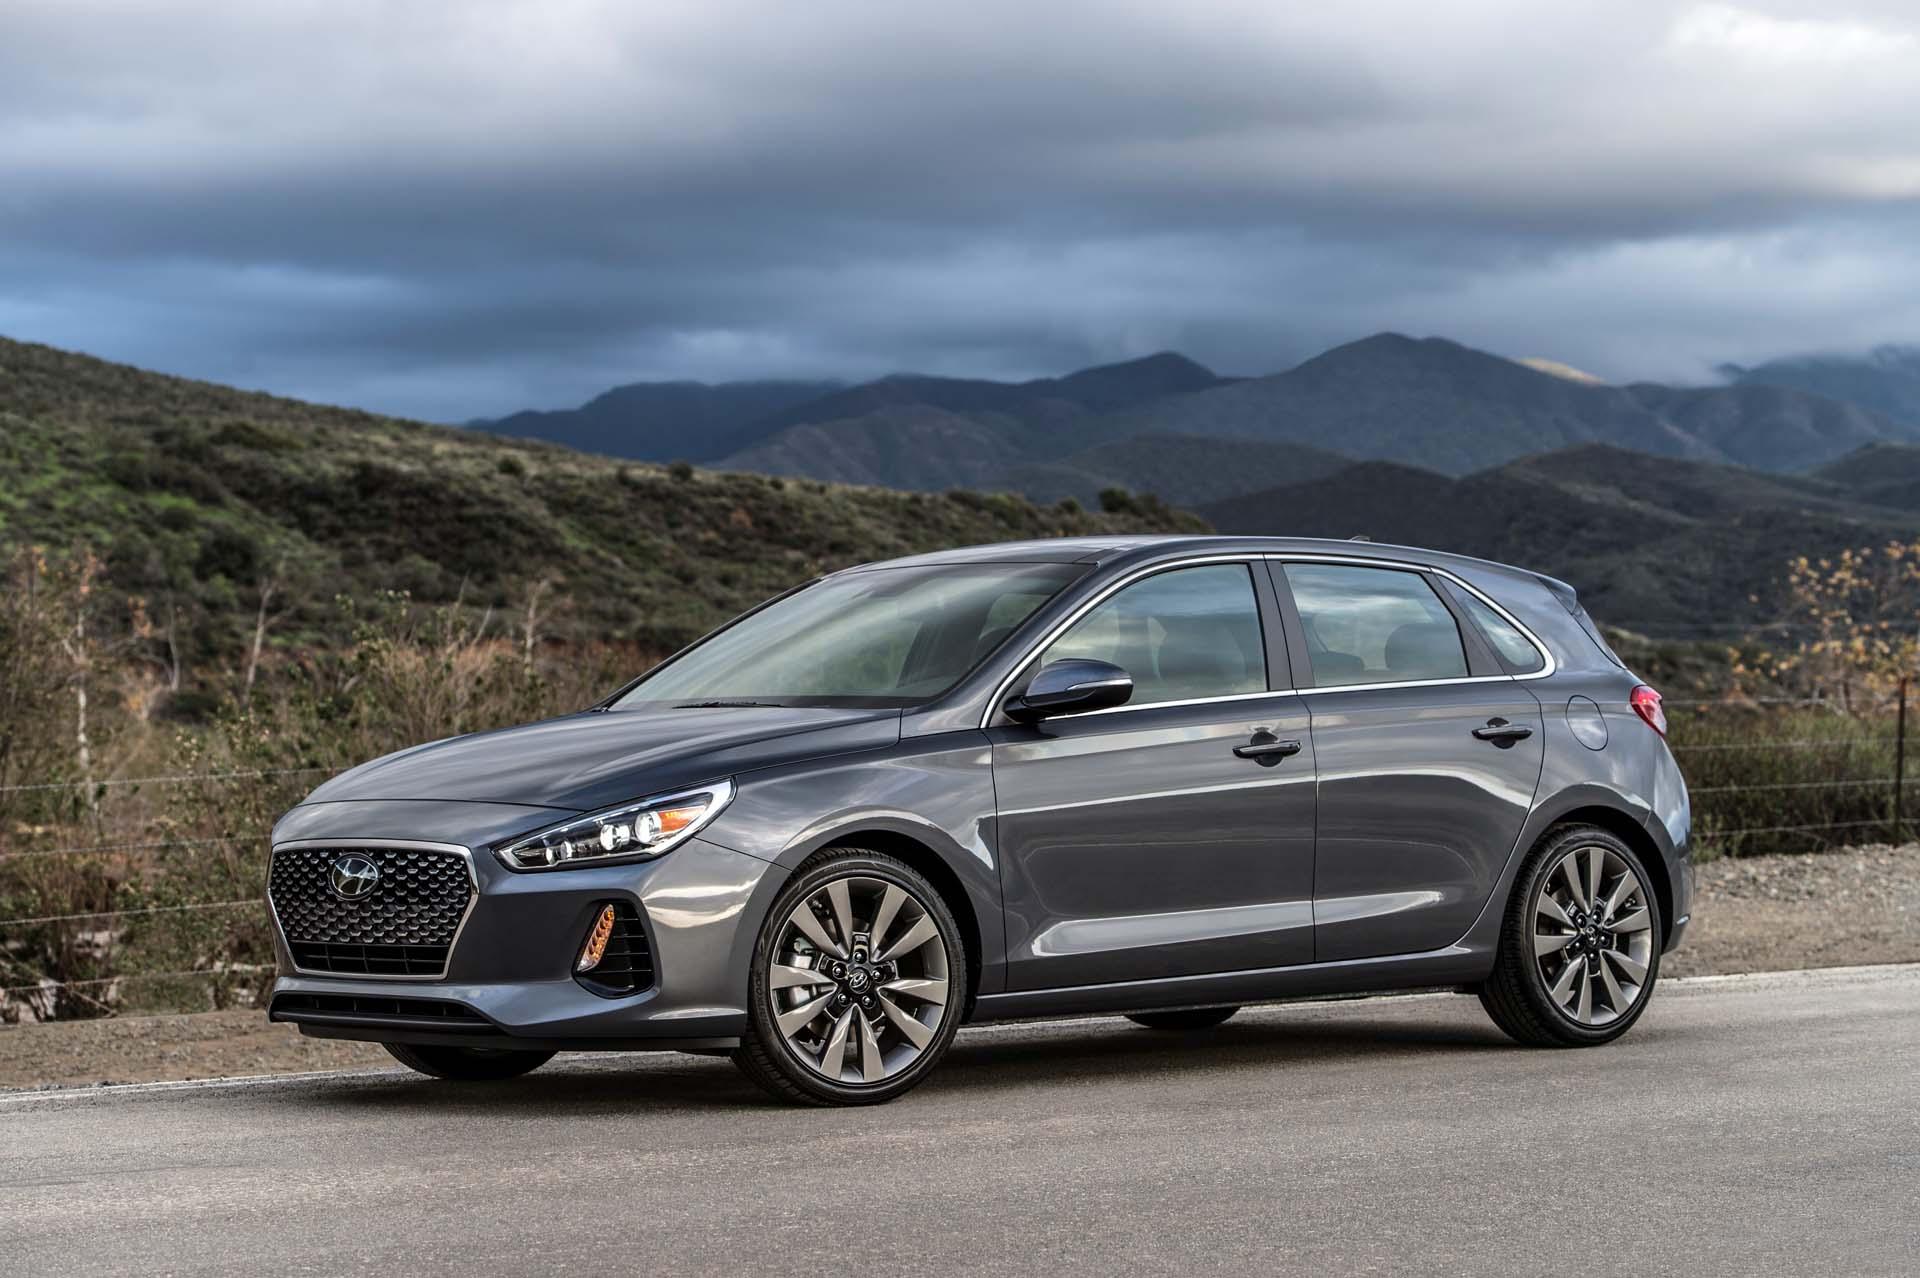 2018 Hyundai Elantra Gt Hatchback Unveiled At Chicago Auto